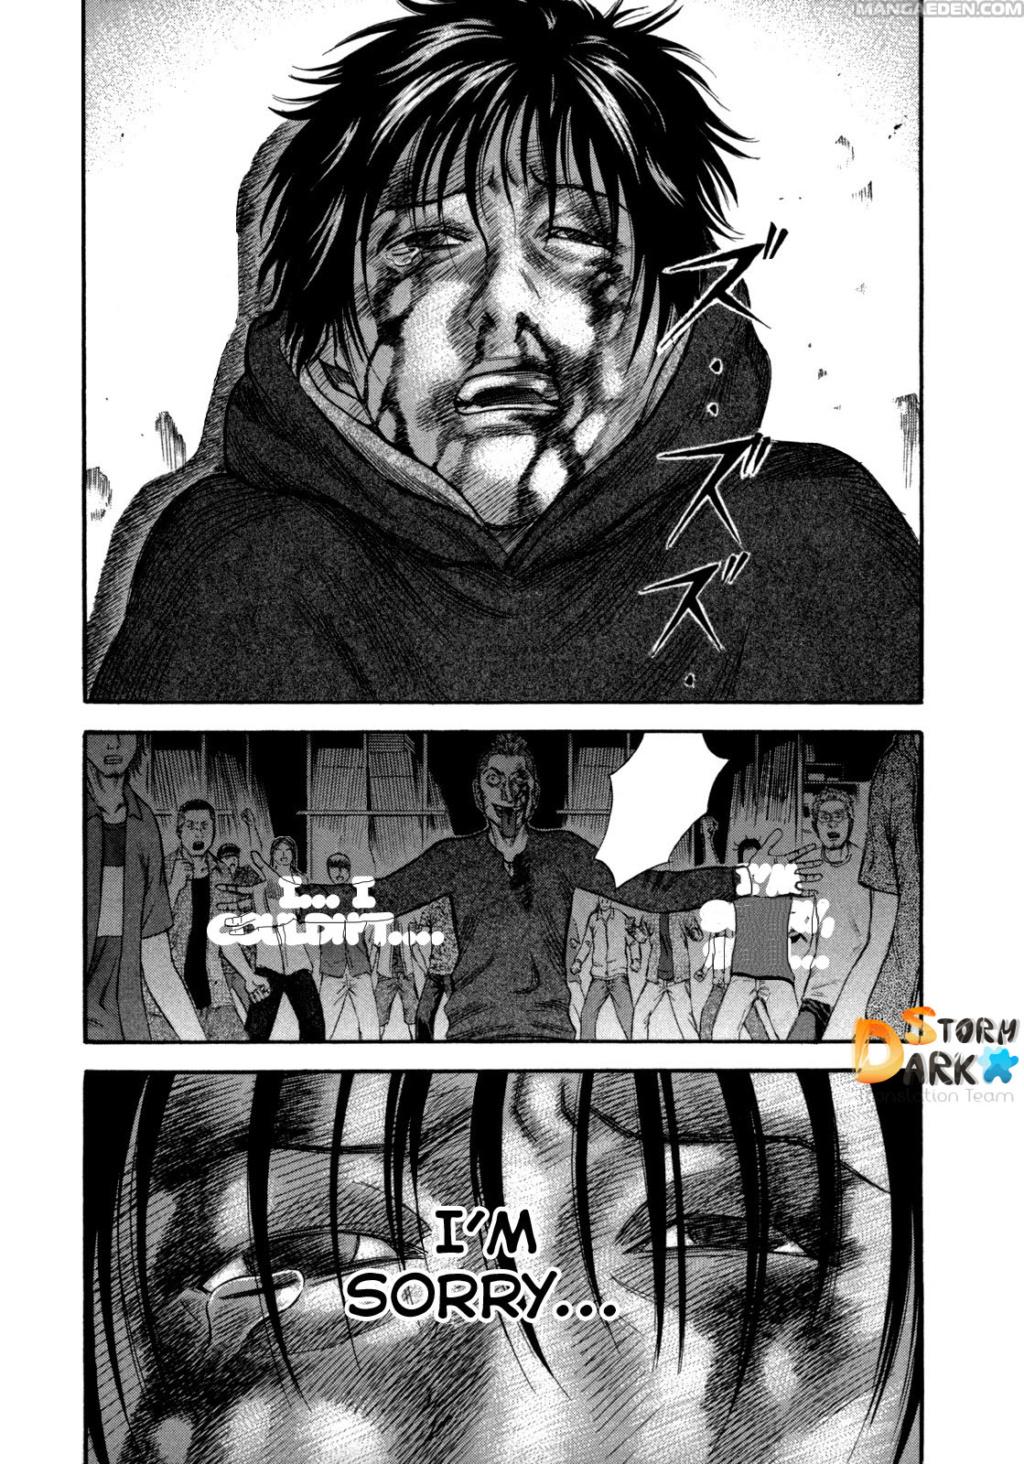 × Dark Storm × .. حيـن تعـصـف ريـآح الـإبدآع ! | فريق ترجمة المانجا - صفحة 18 090910